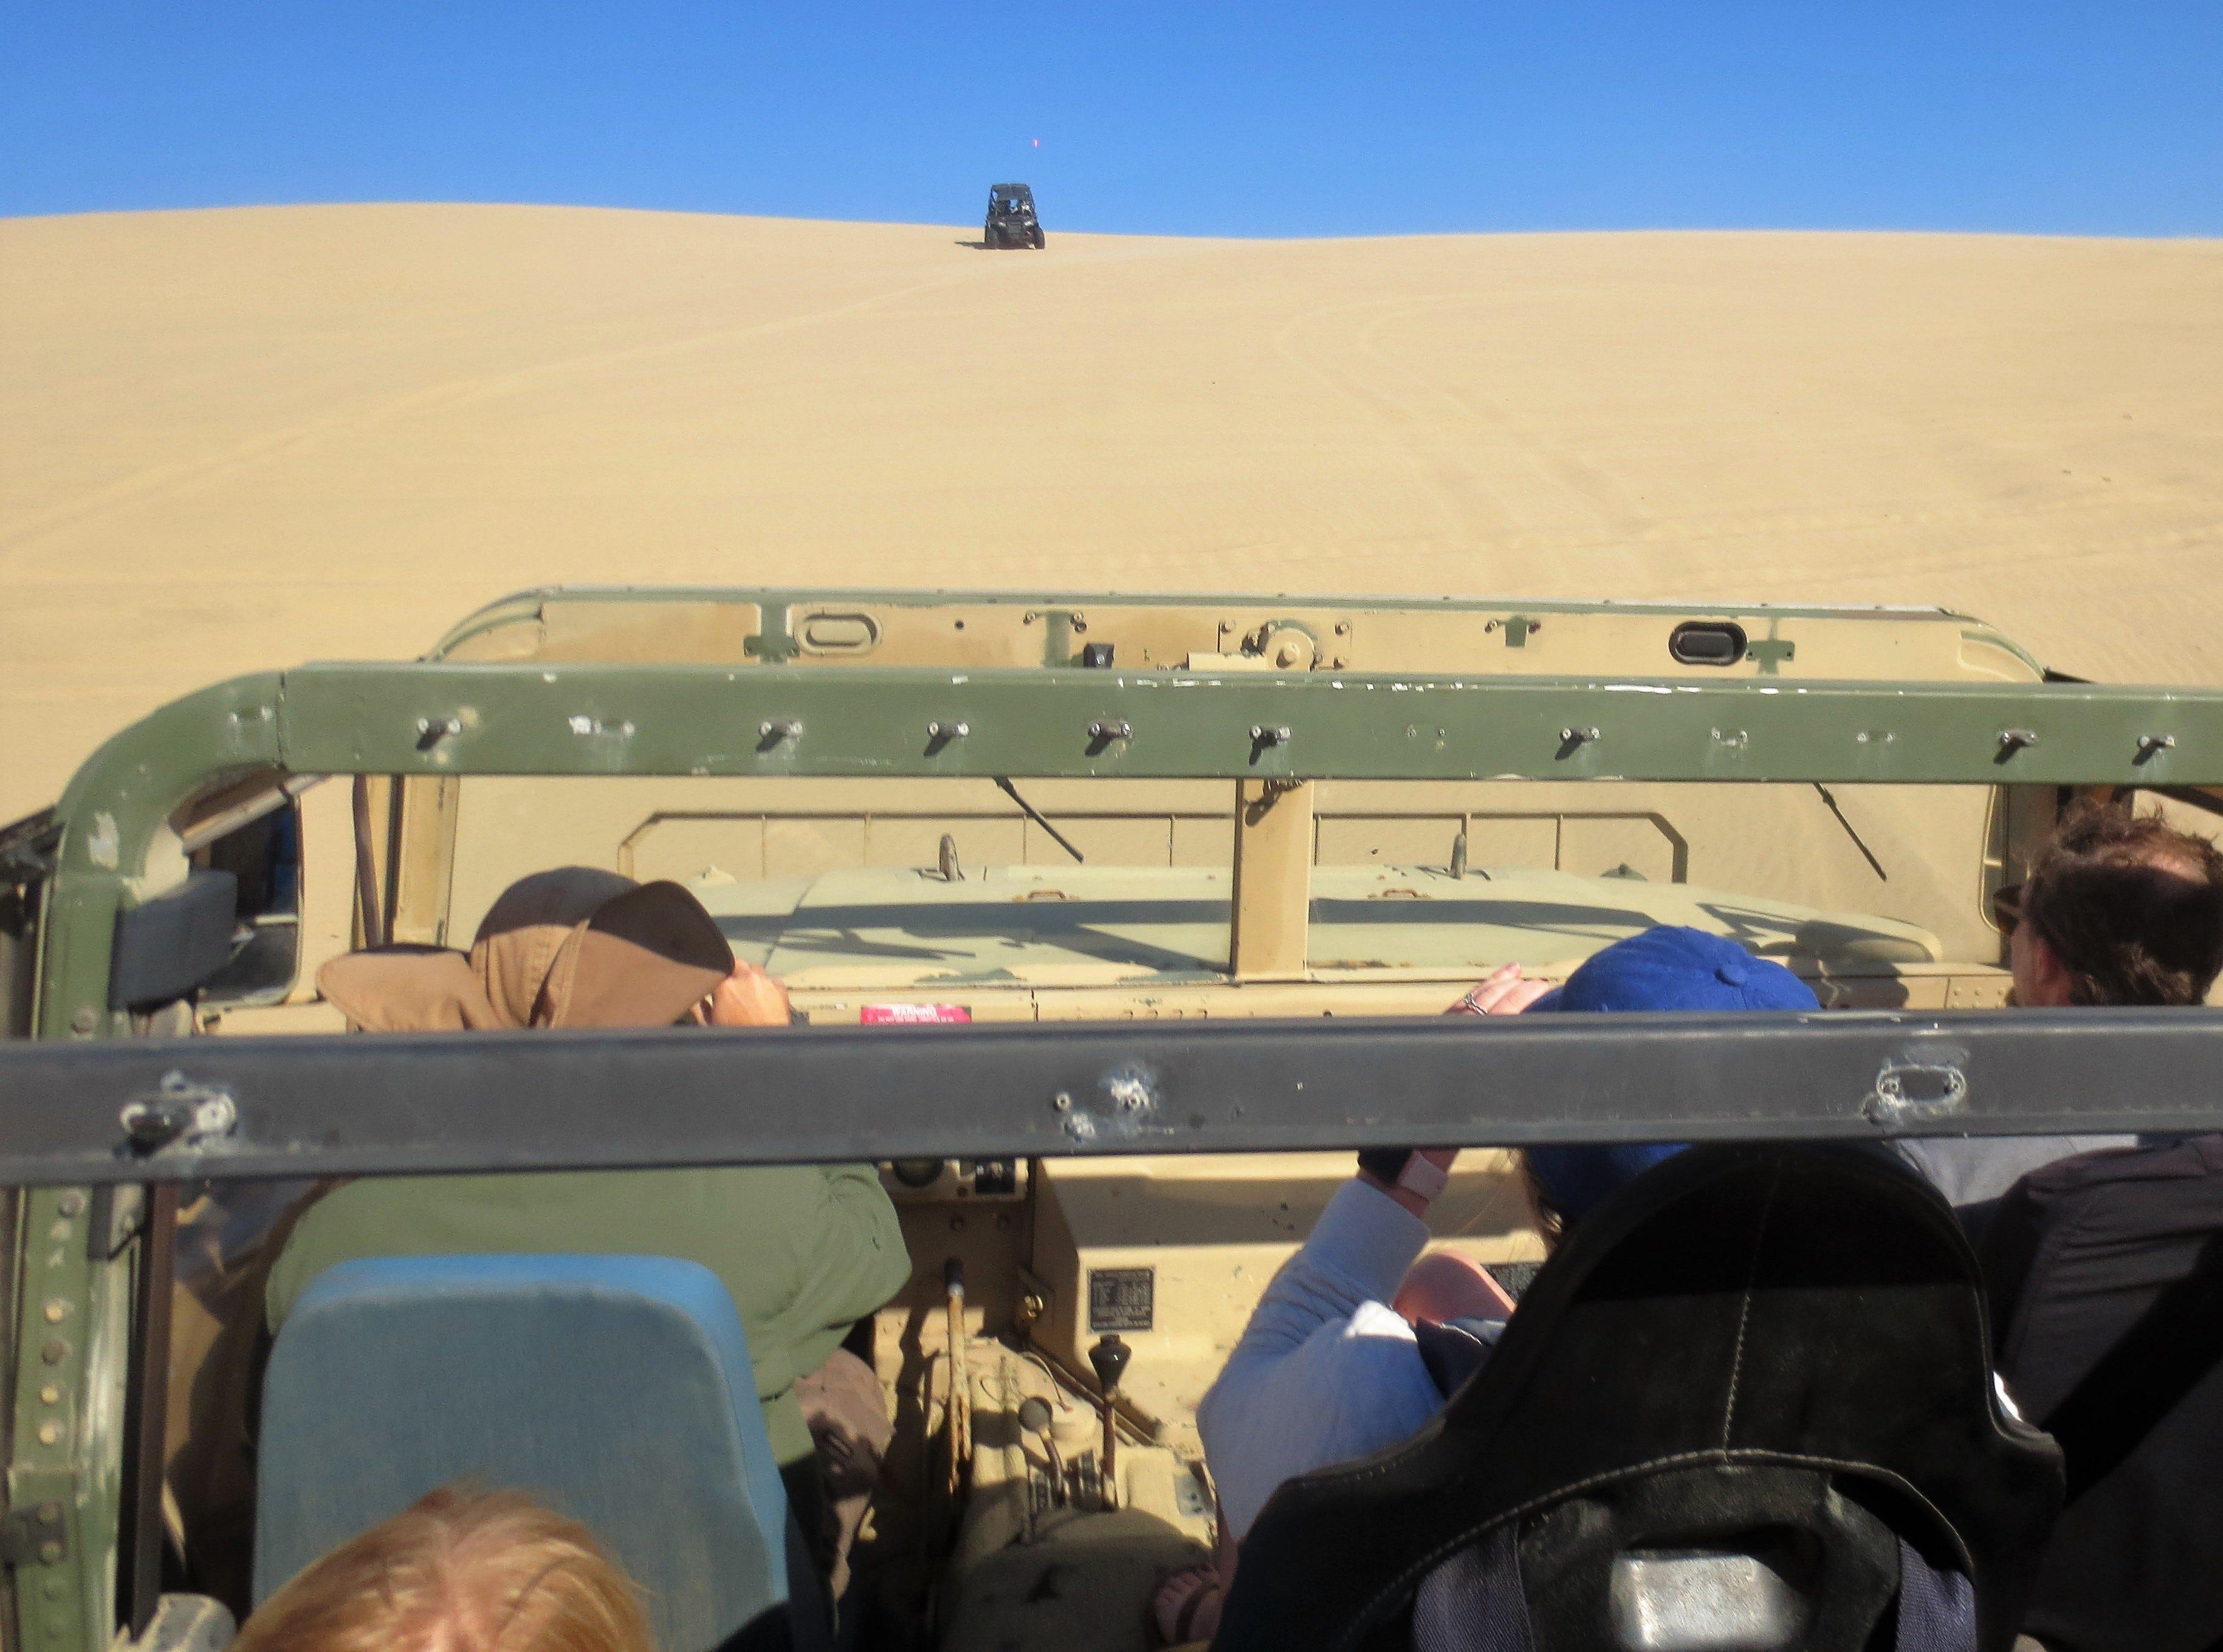 Humvees traverse the dunes near Pismo Beach in San Luis Obispo County.